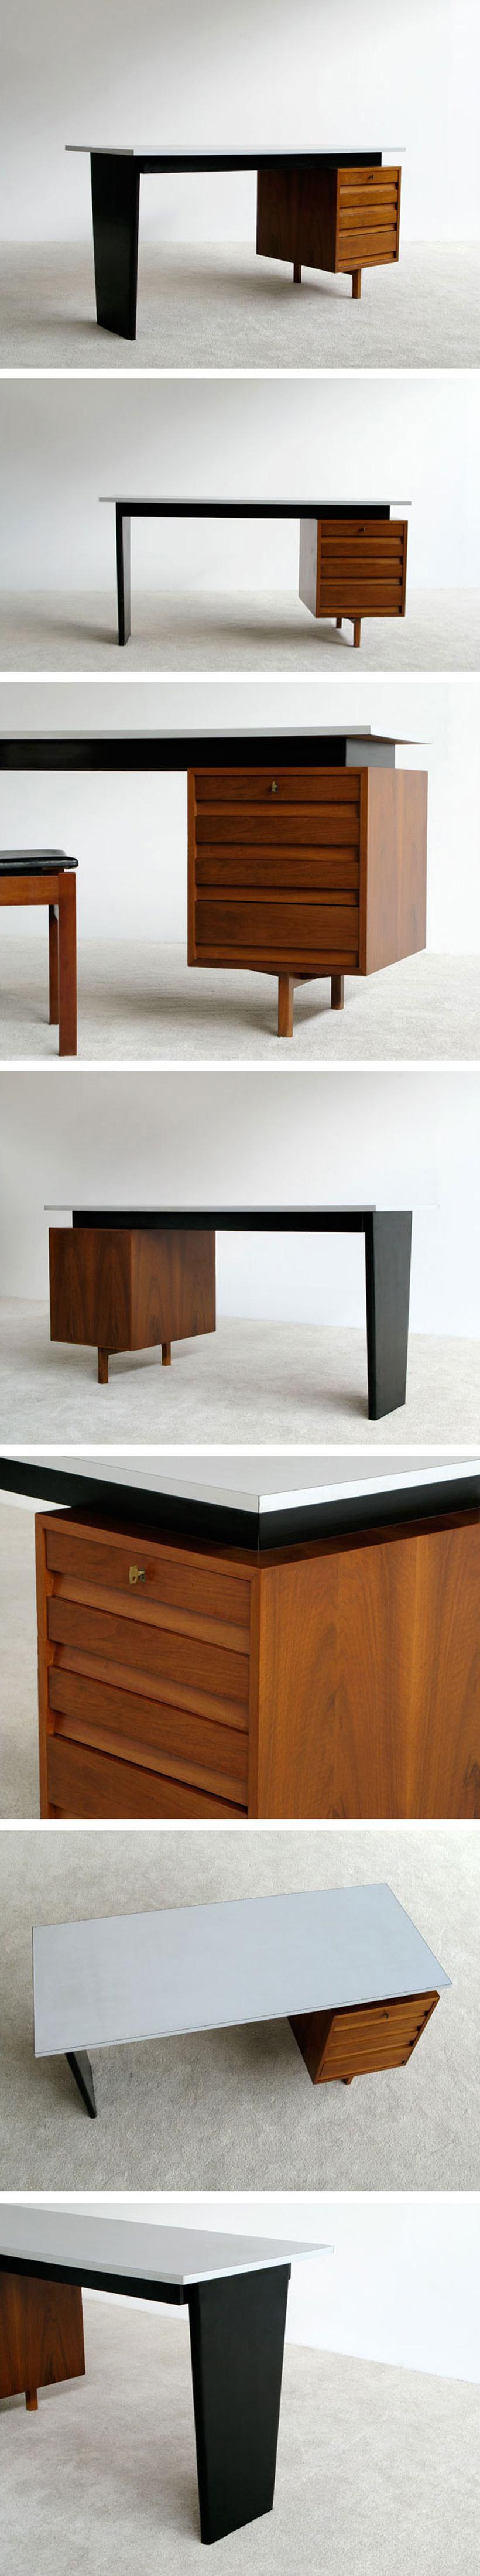 Van den Berghe-Pauvers Jos De Mey modern office desk Large